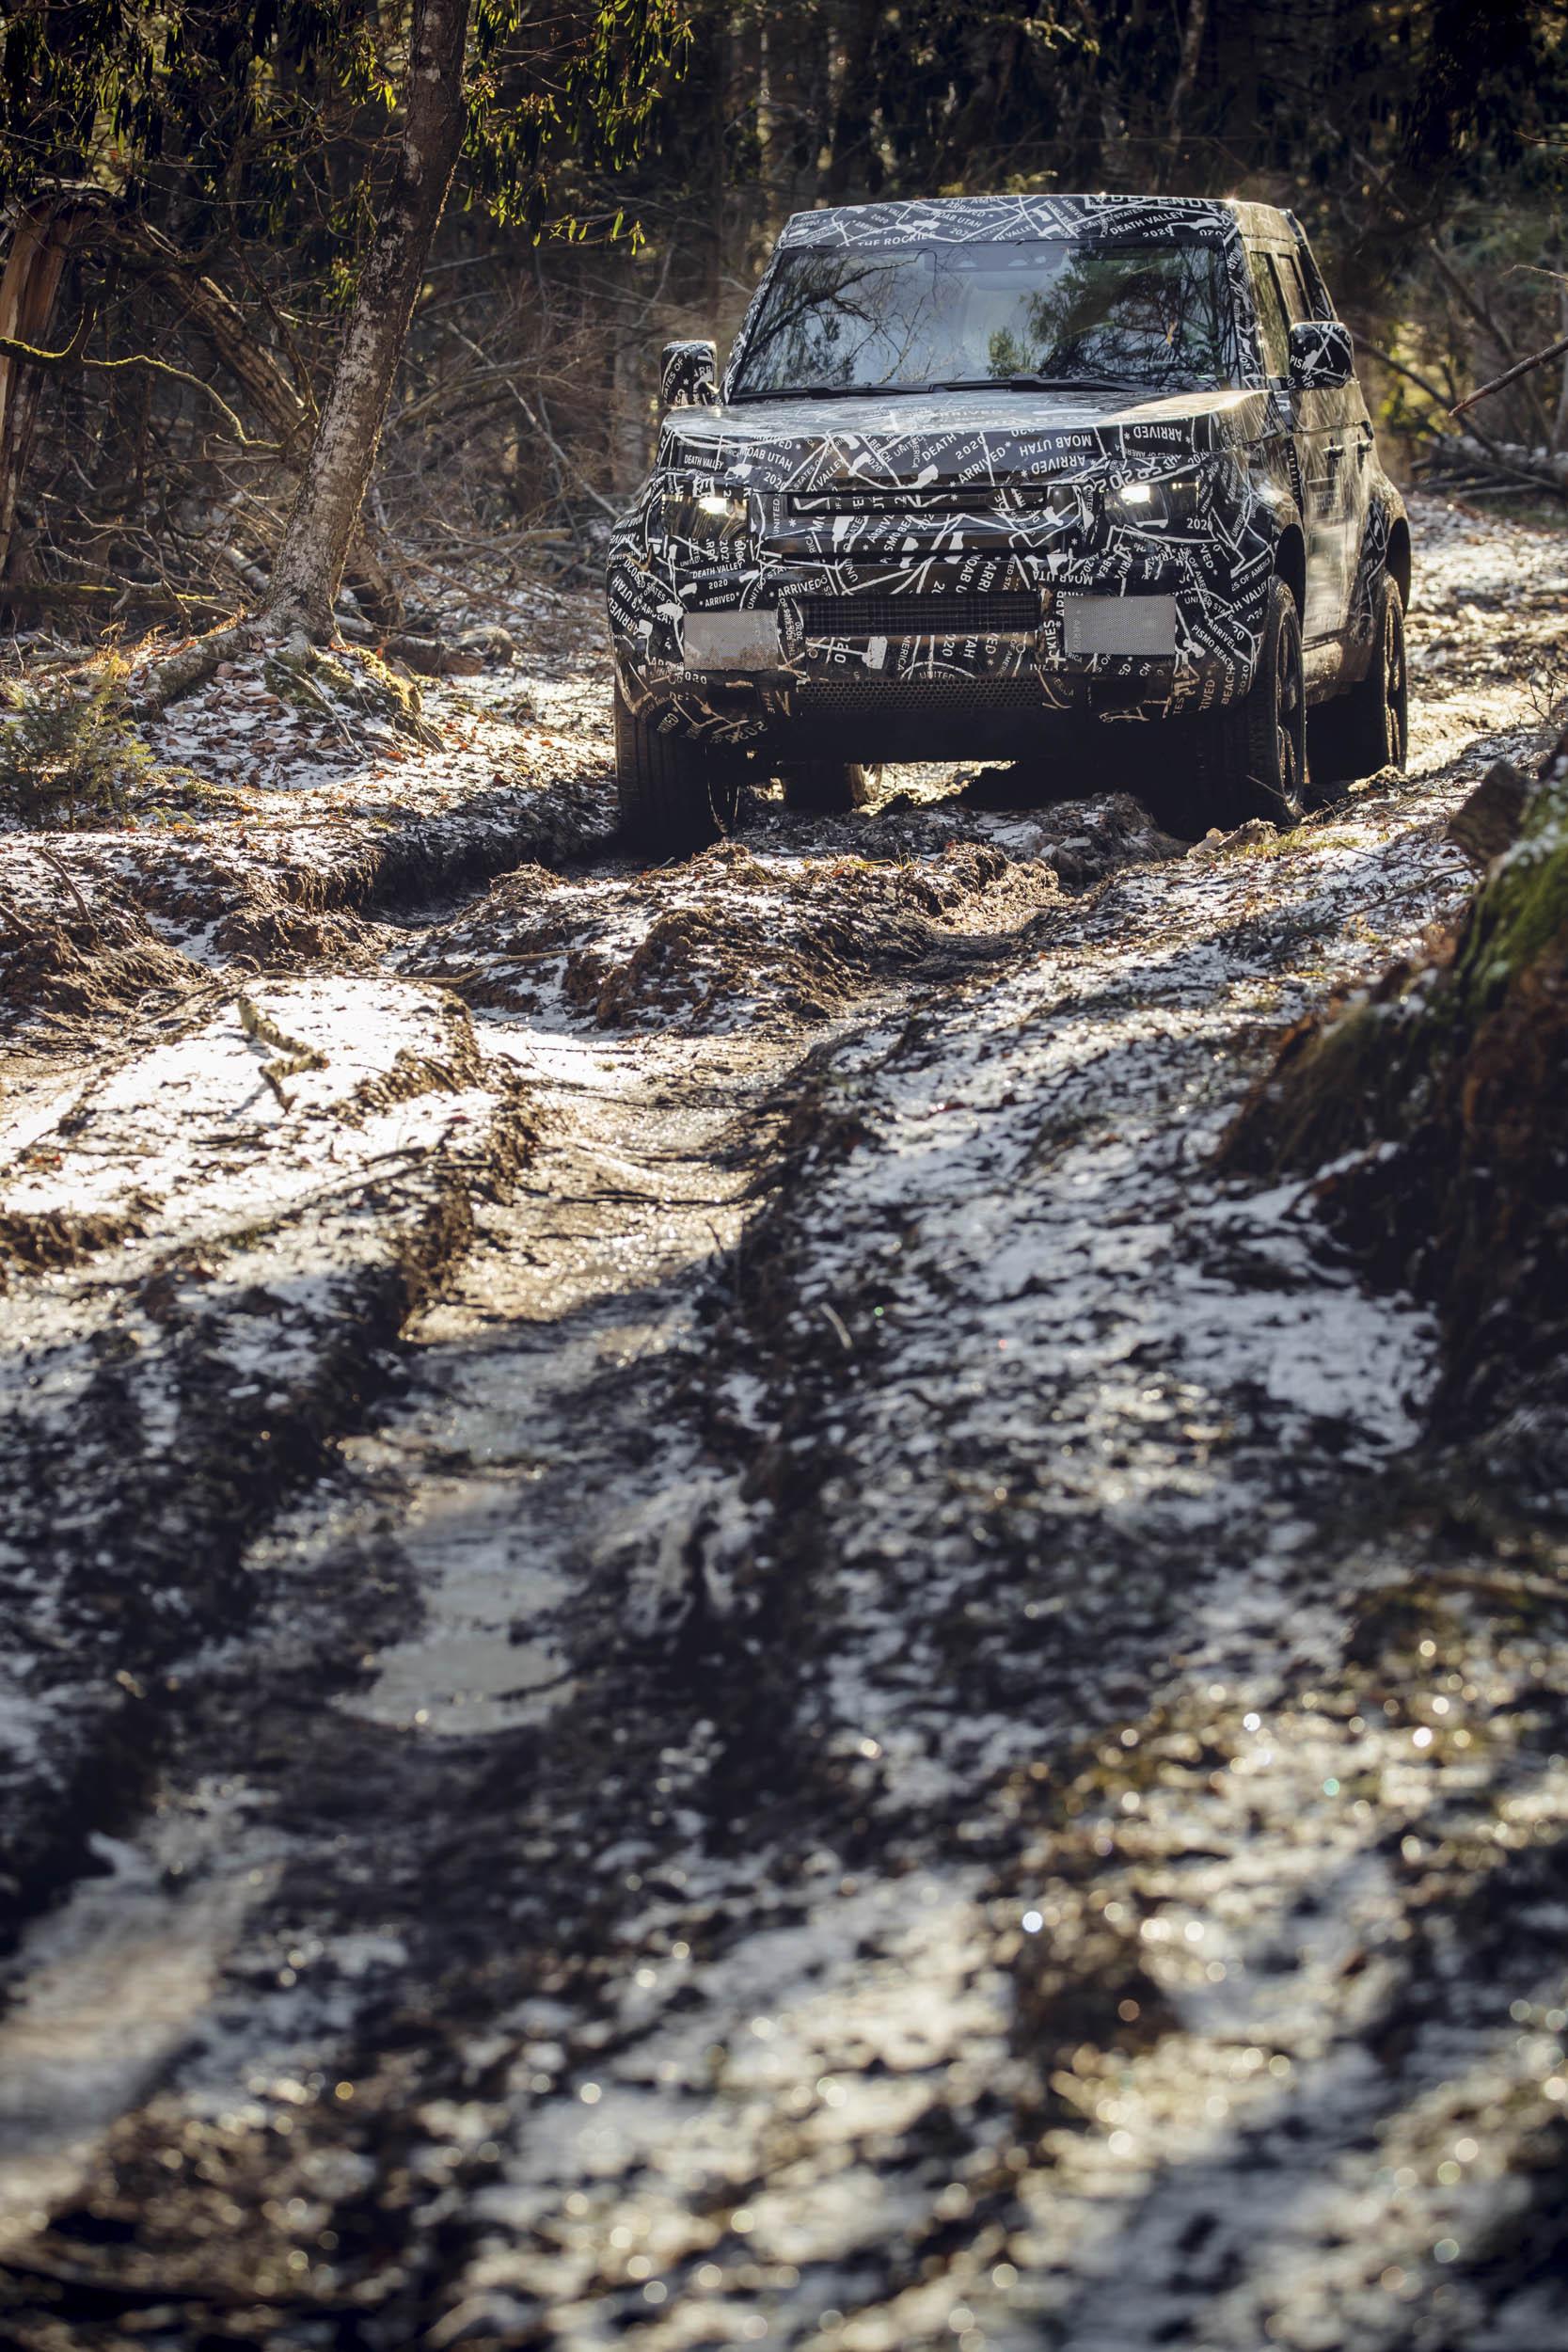 2020 Land Rover Defender mudding